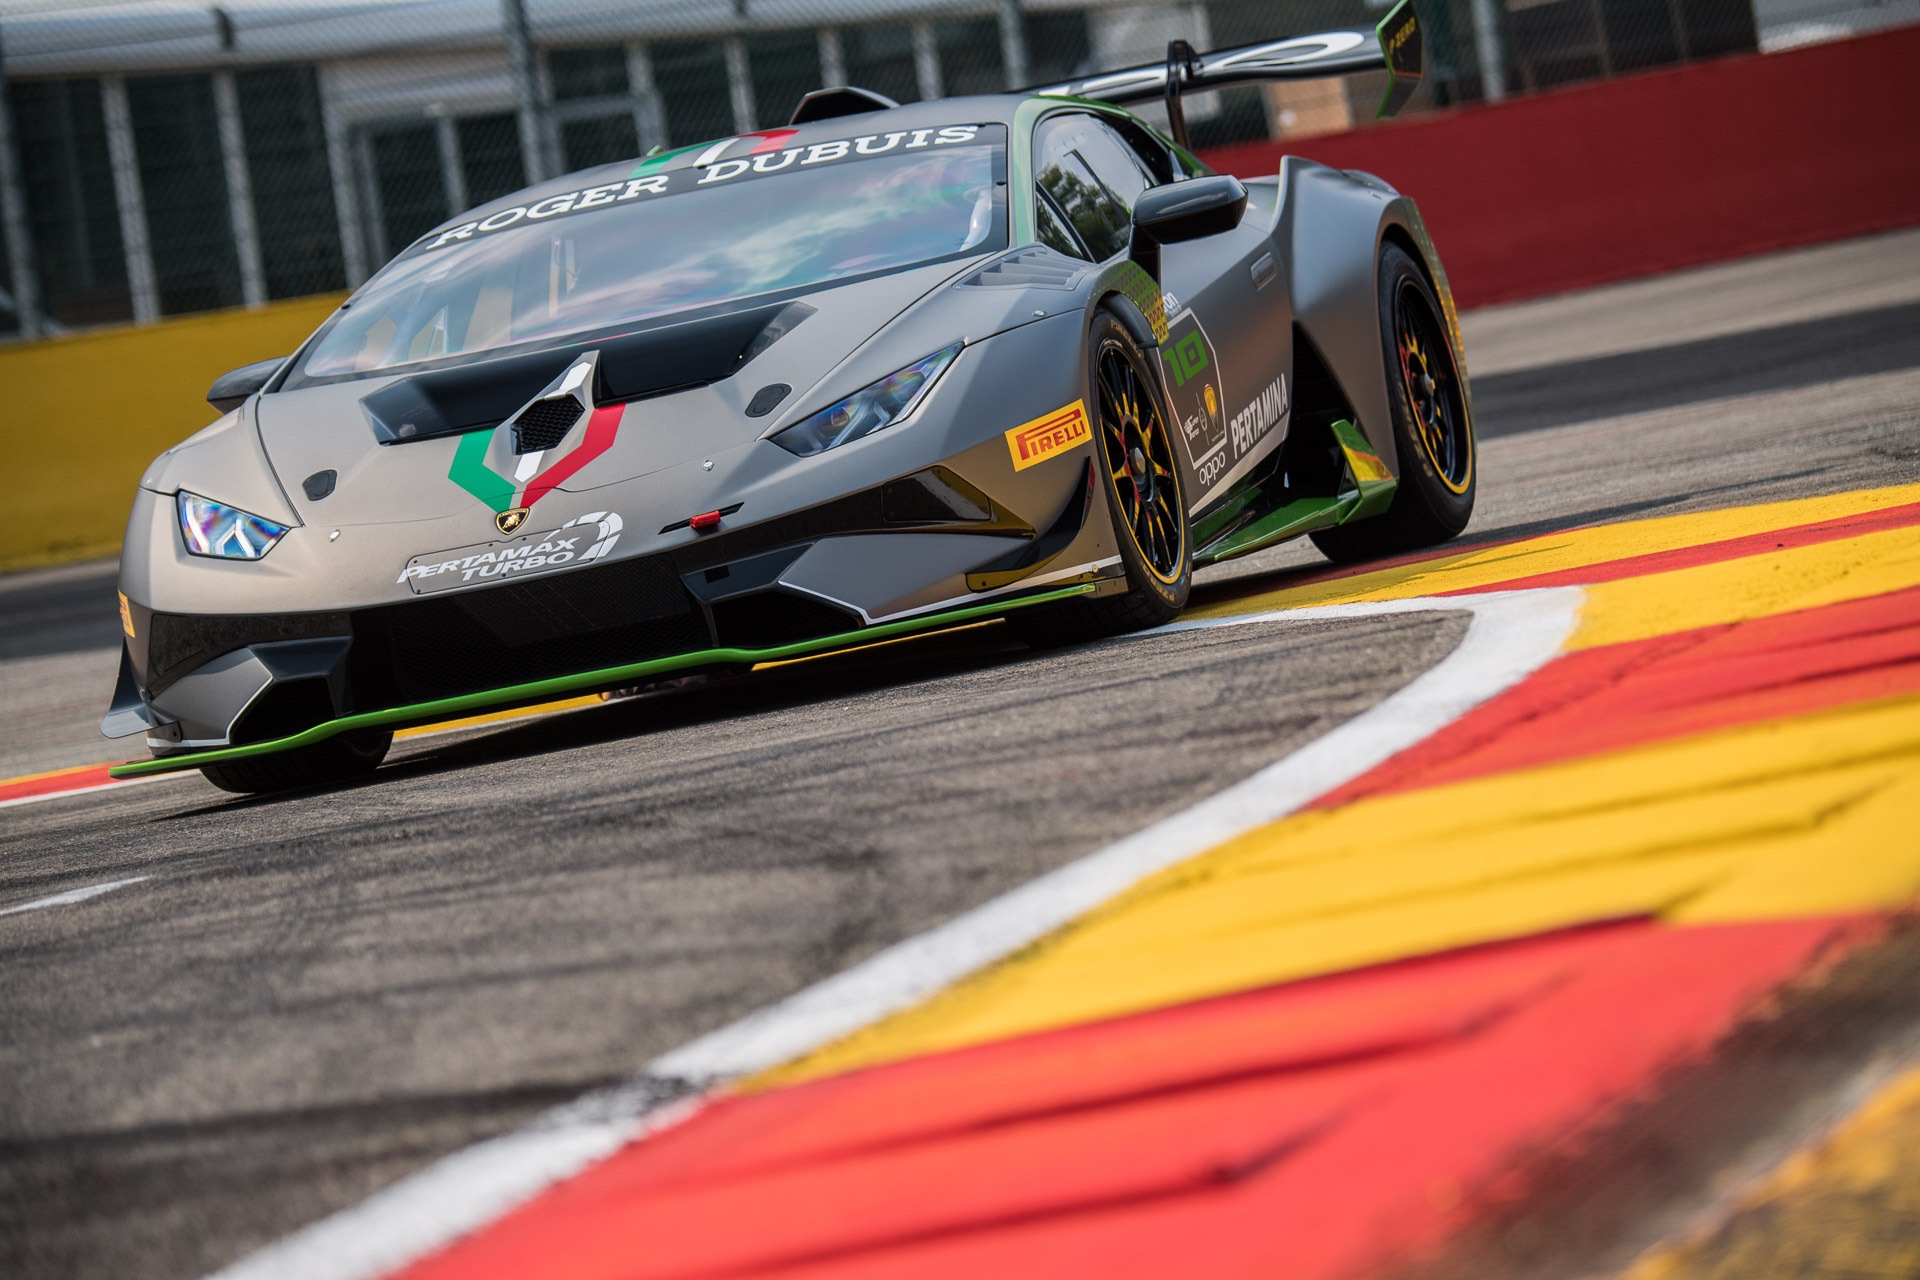 Lamborghini_Huracan_Super_Trofeo_Evo_10th_Edition_0006